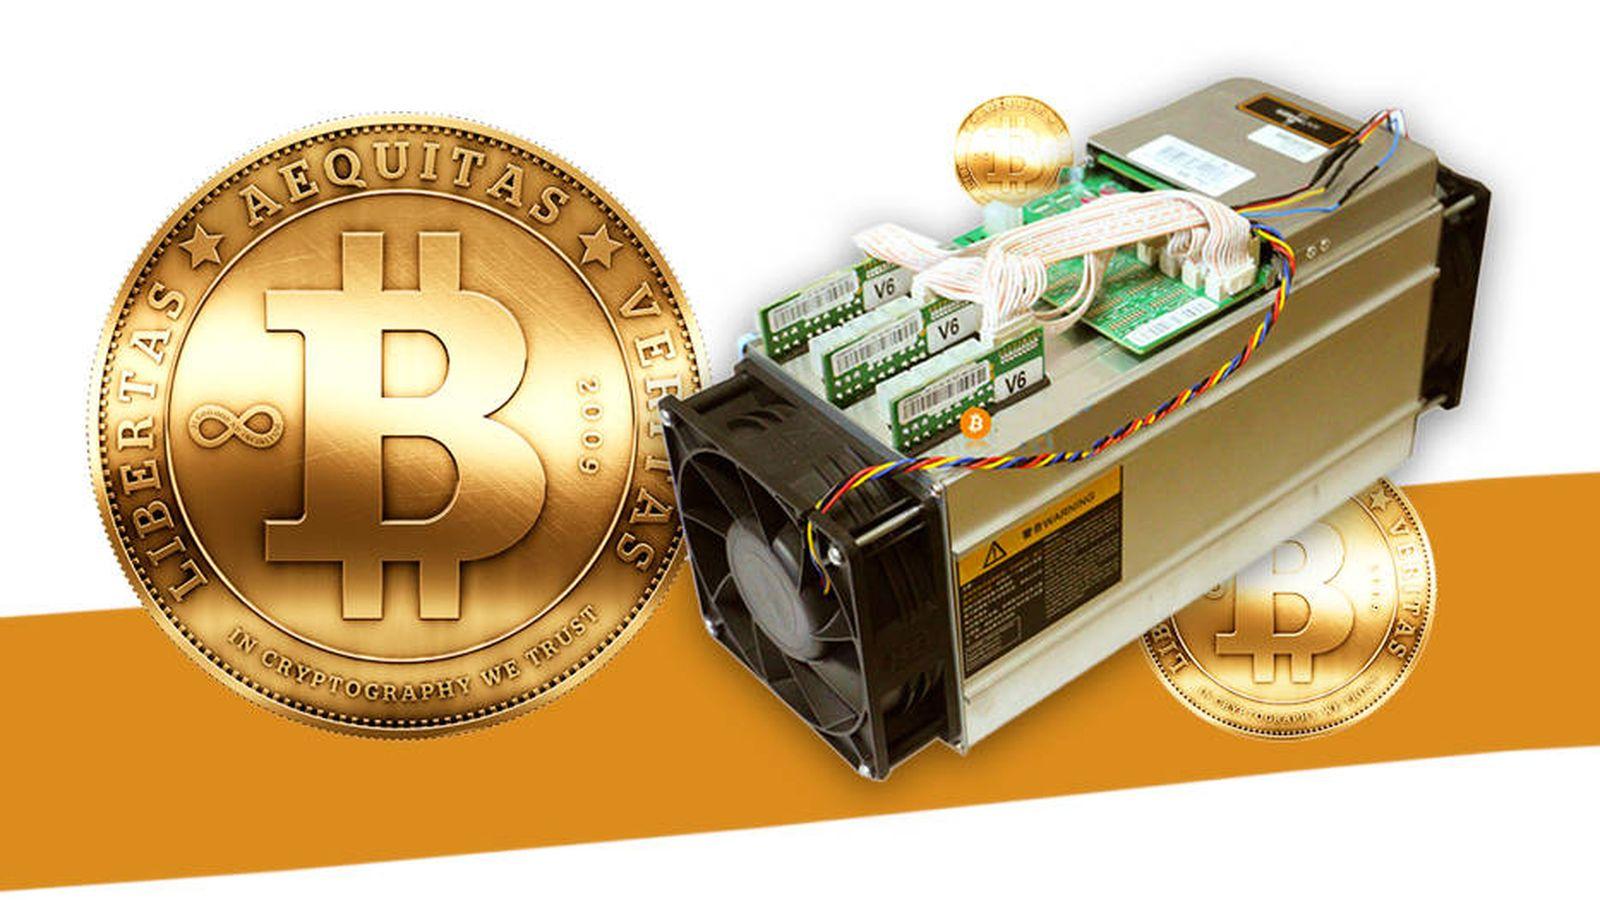 Ganar dinero minado bitcoins news betting offers betfred